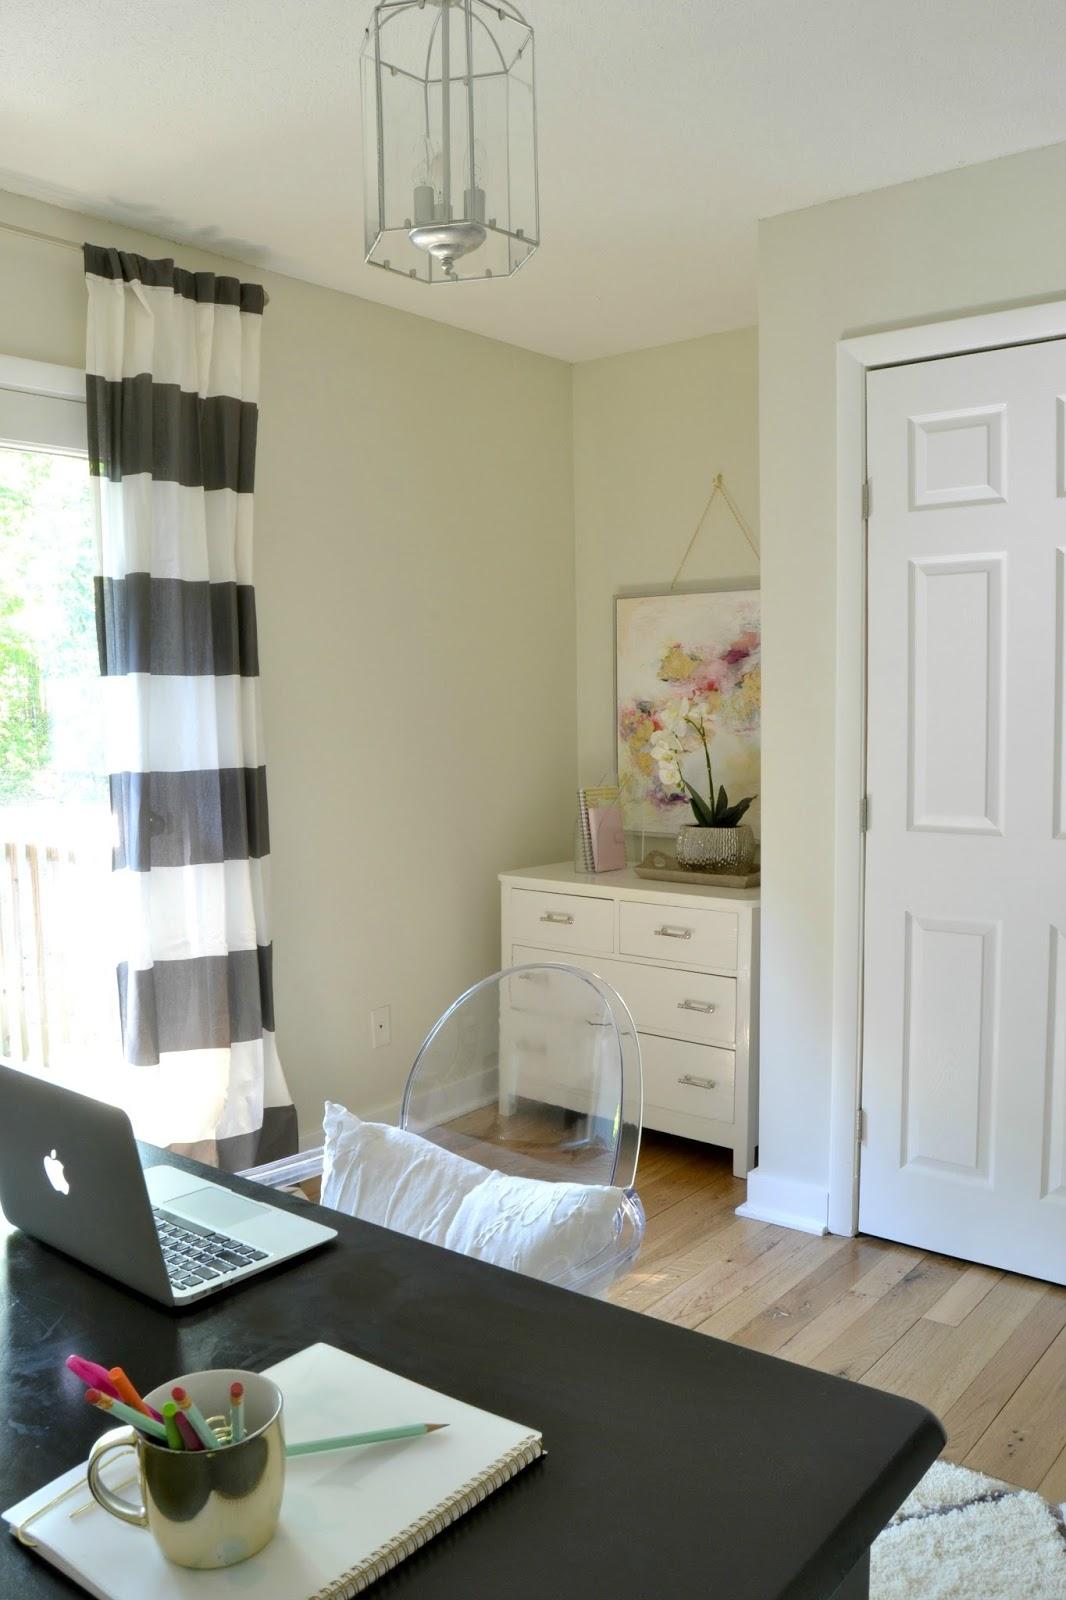 Livelovediy 10 Home Improvement Ideas How To Make The